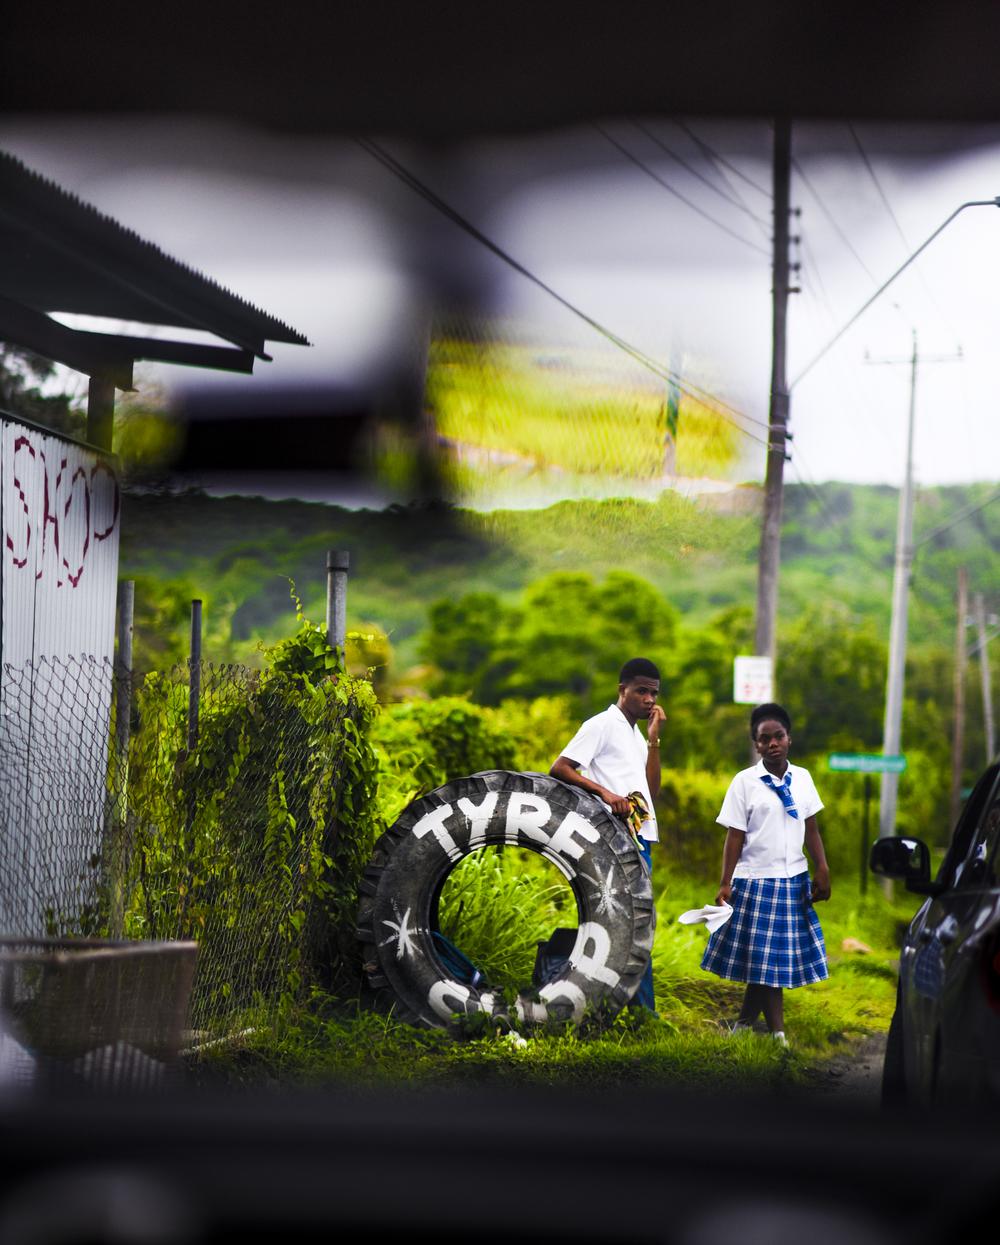 Vert-Dapper-Lou-Trinidad-Tobago-2016-11.jpg